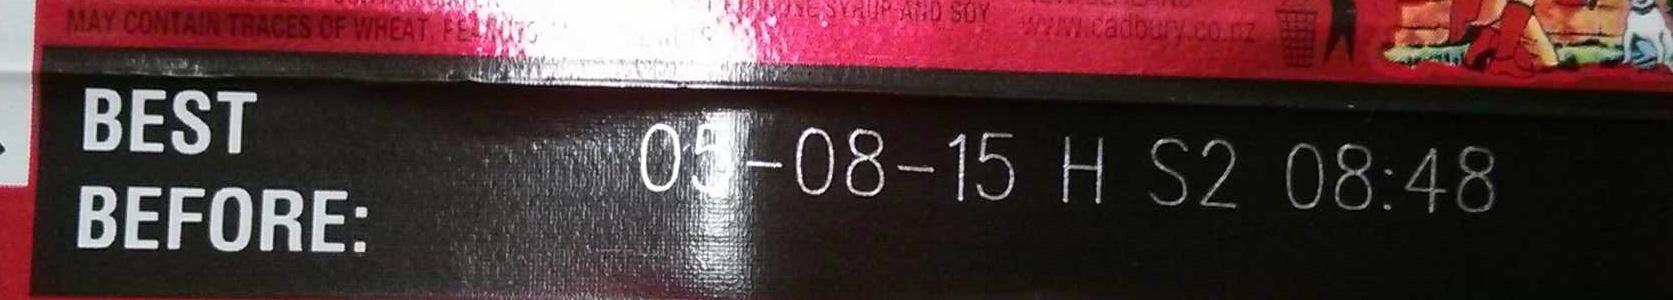 Cherry Ripe - Ingredients